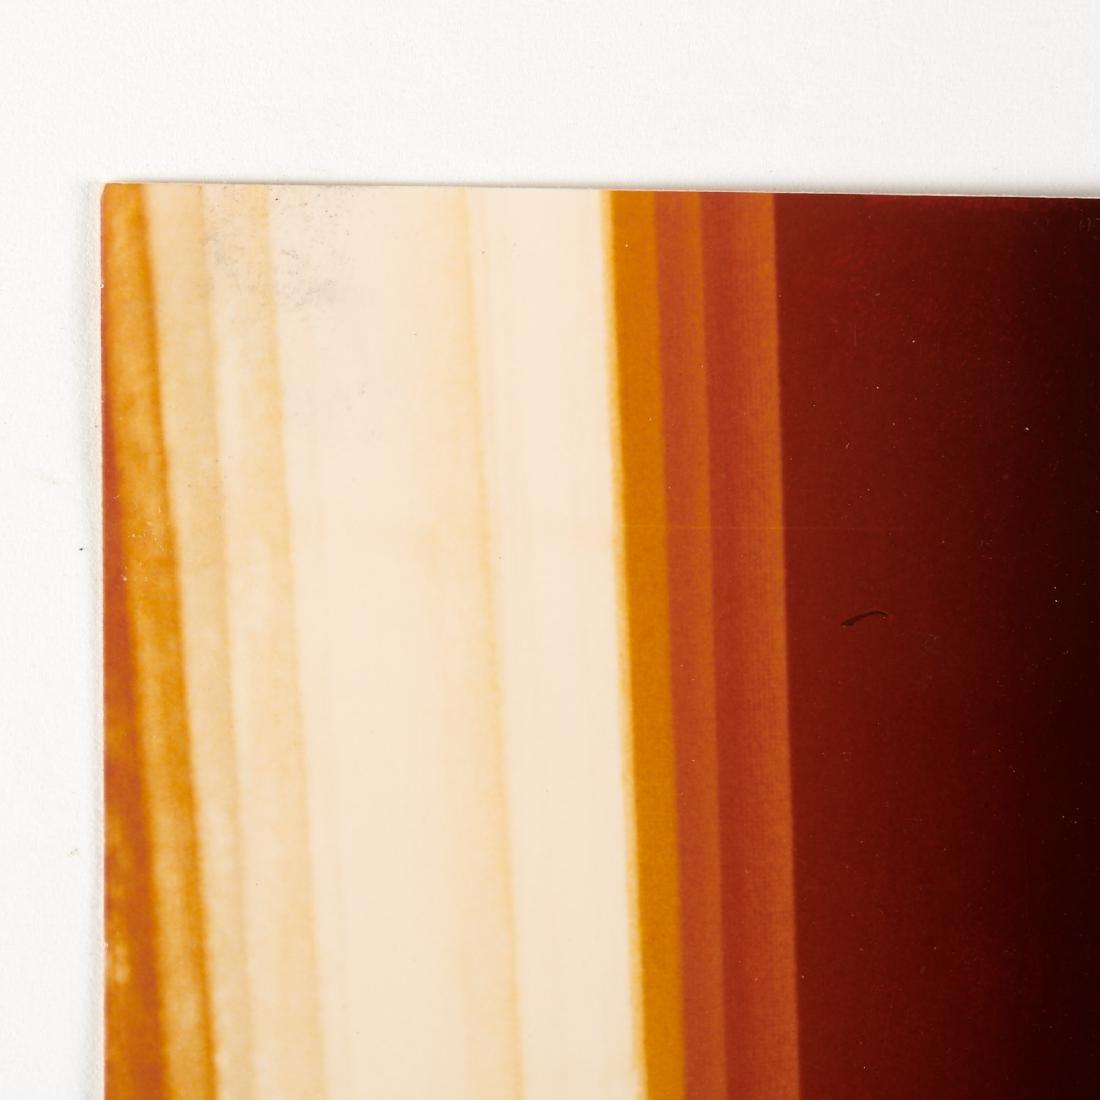 David Hockney, photograph - 2